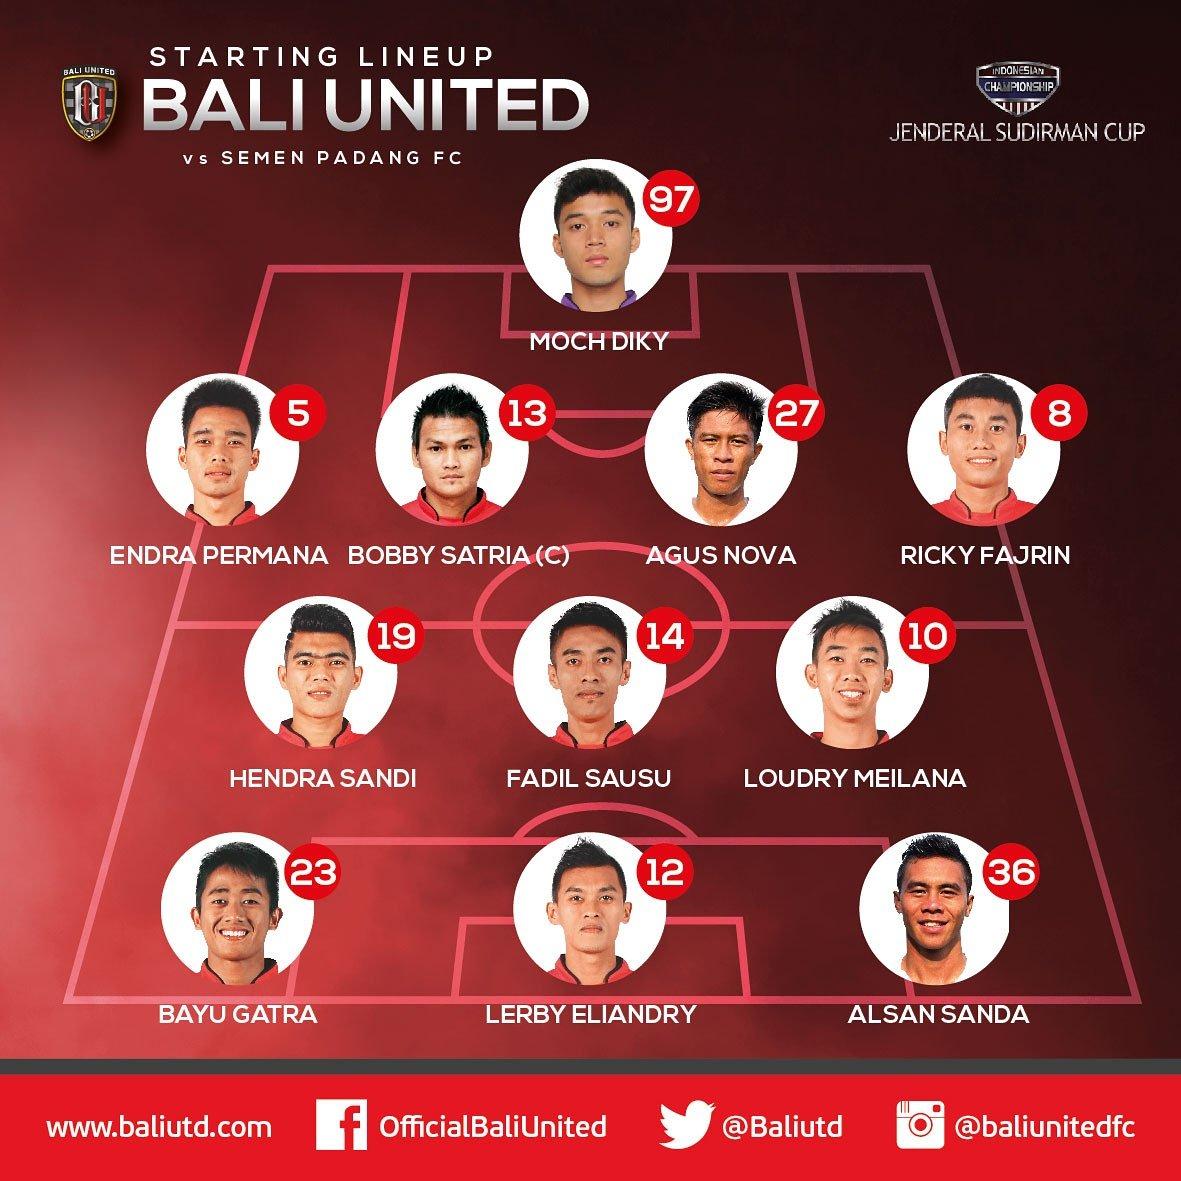 Bali United Fc On Twitter Starting Lineup Bali United Vs Psm Makassar Baliunited Baliunitedday Pialajendralsudirman Https T Co Aqscrx0vrq